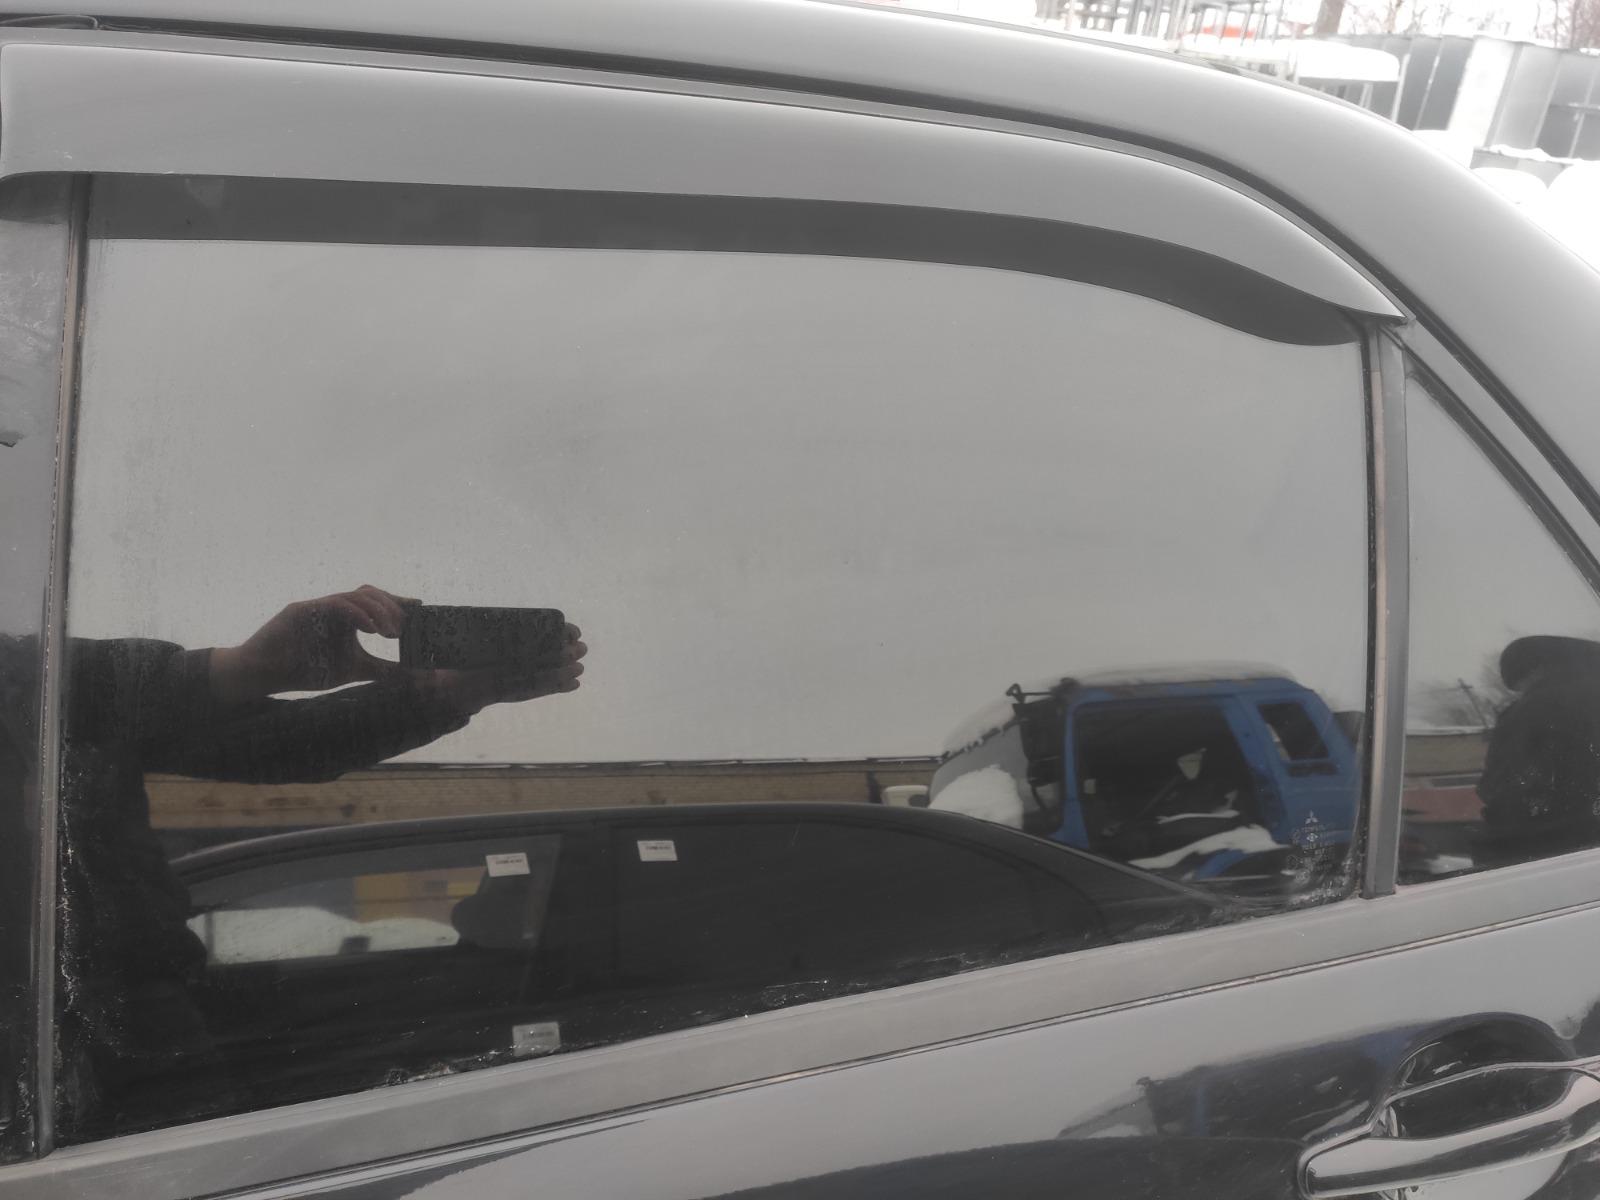 Стекло дверное Mitsubishi Lancer 9 СЕДАН 1.6 2006 заднее левое (б/у)